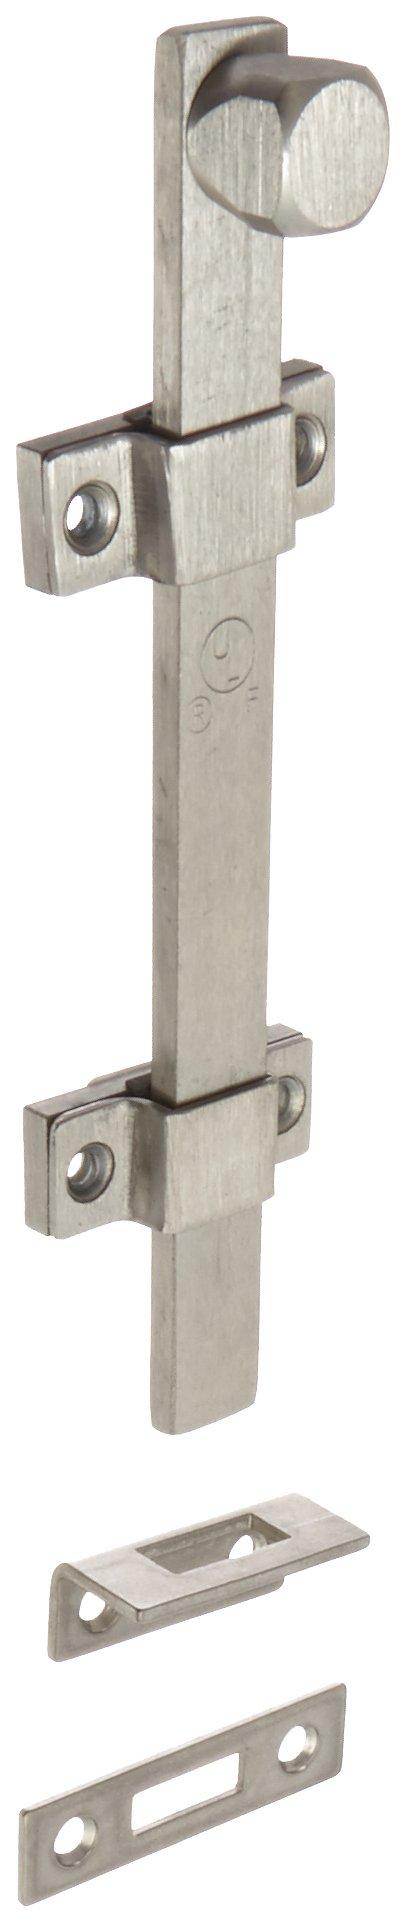 Rockwood 580-8.32D Stainless Steel Surface Bolt, UL Listed, 8'' Length, Satin Finish